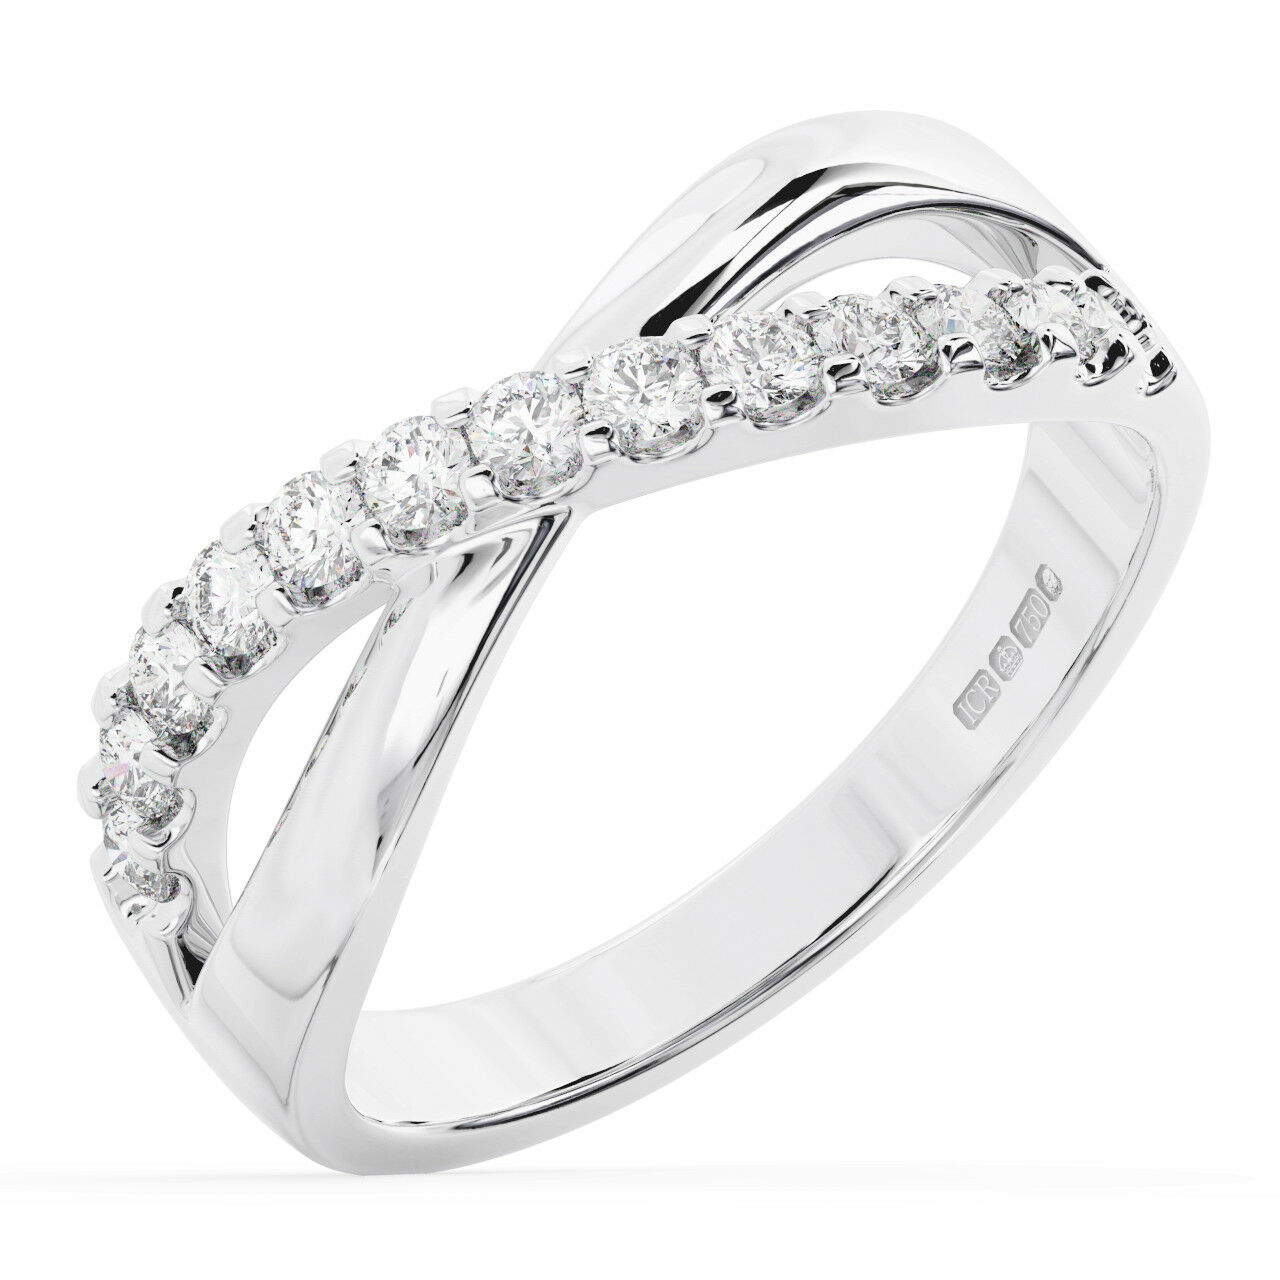 95bd34b1f2dcde Set Round Diamonds Wedding Ring in Metal 9K gold Credver 0.40CTClaw  qvizla2641-Diamond